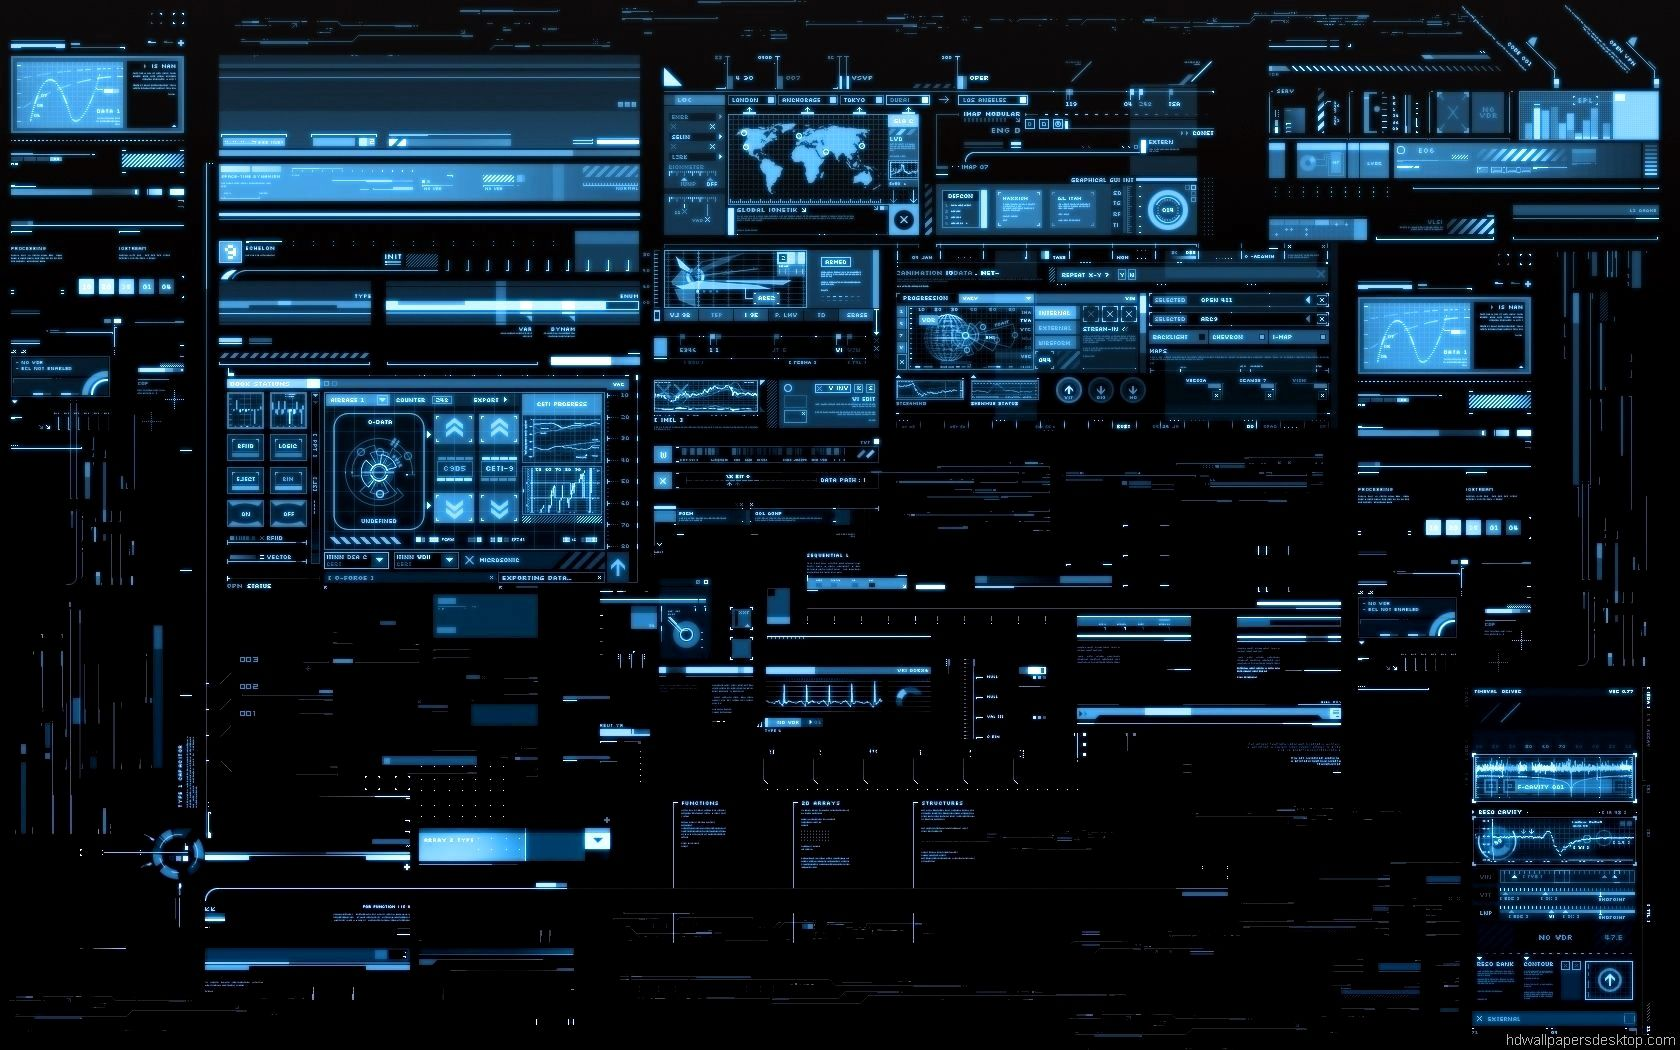 Hacking Wallpaper 4k For Pc Gallery Technology Wallpaper Computer Screen Wallpaper Desktop Wallpapers Backgrounds